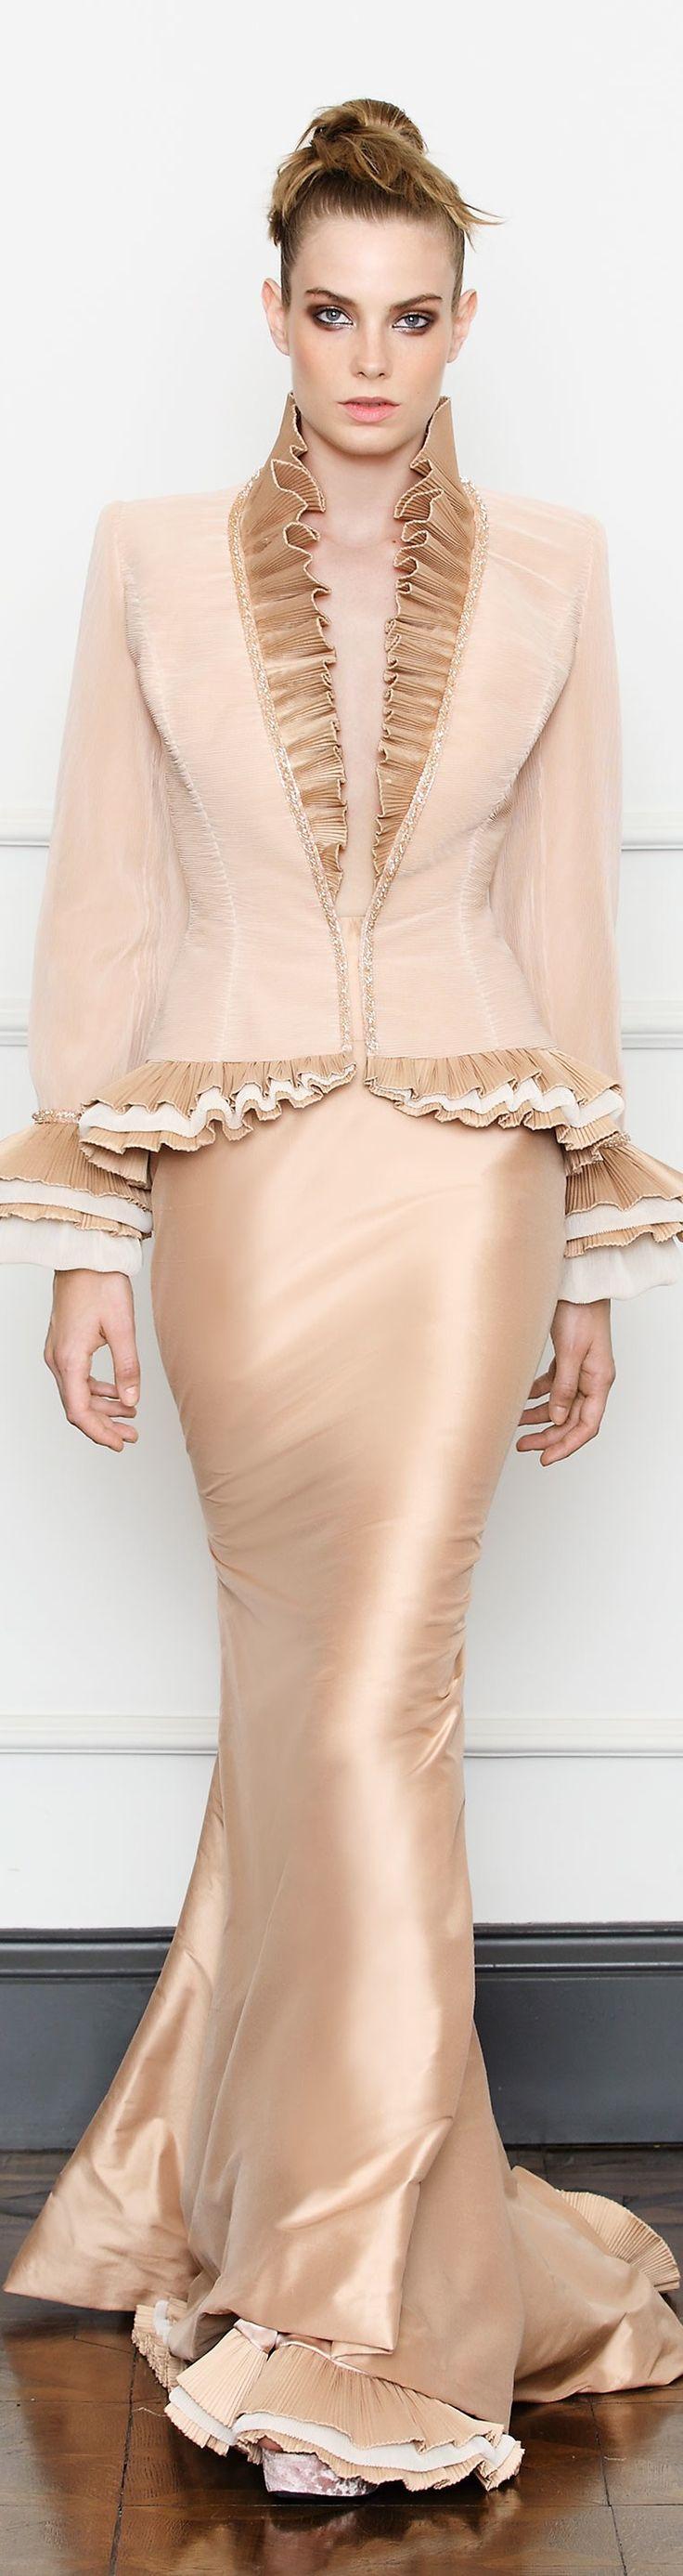 Dilek Hanif couture 2015/16